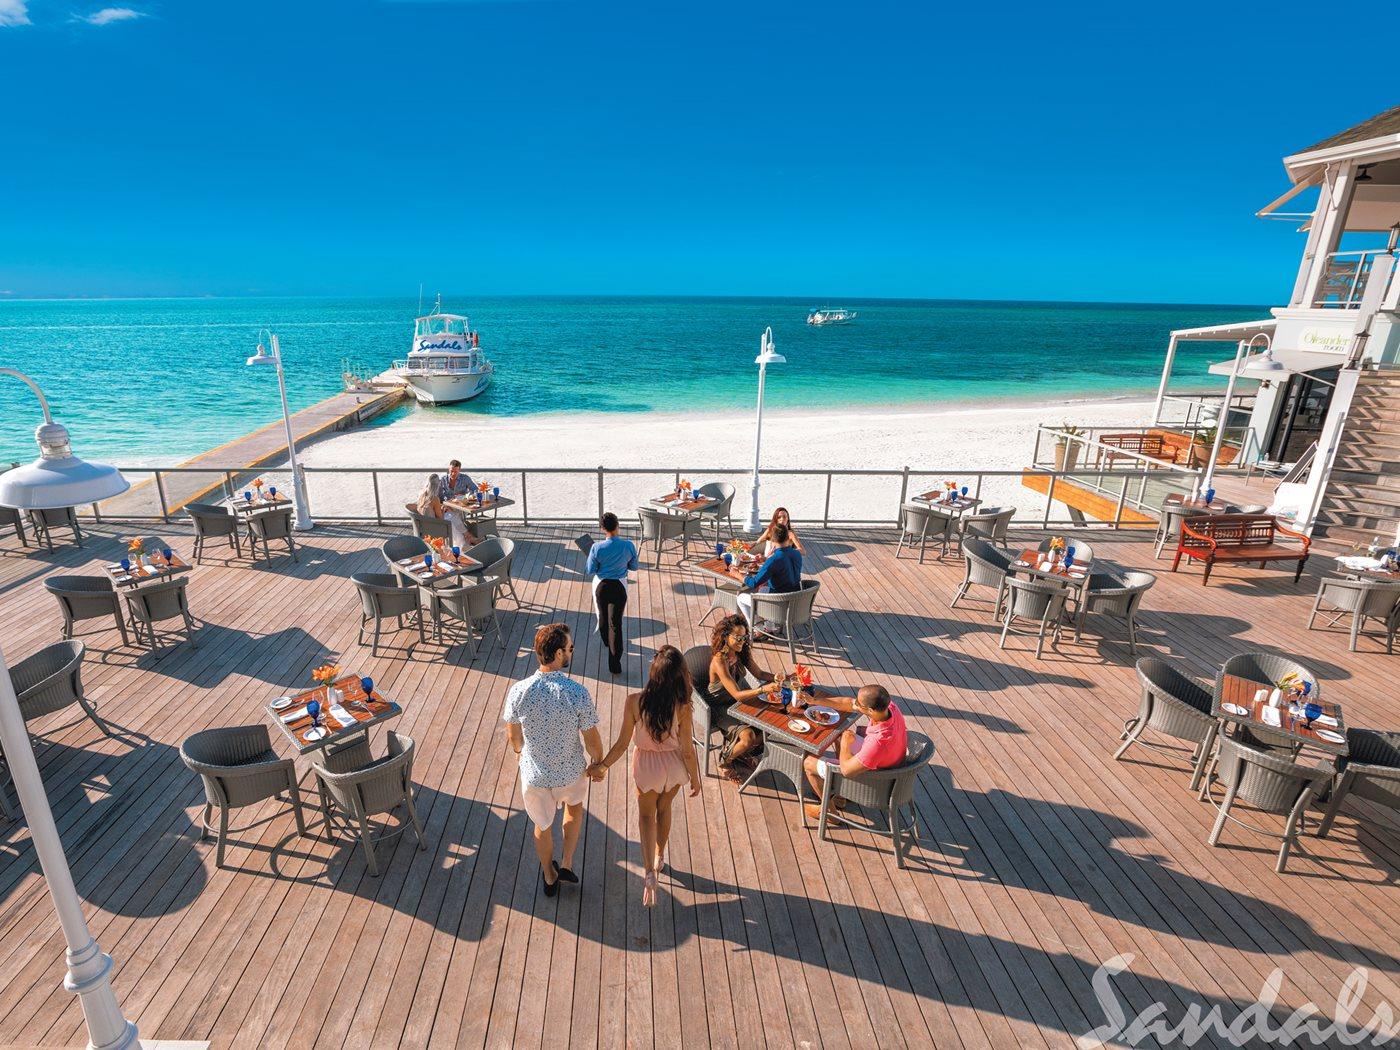 e4b181aeb Restaurants and bars - Sandals Montego Bay - Montego Bay